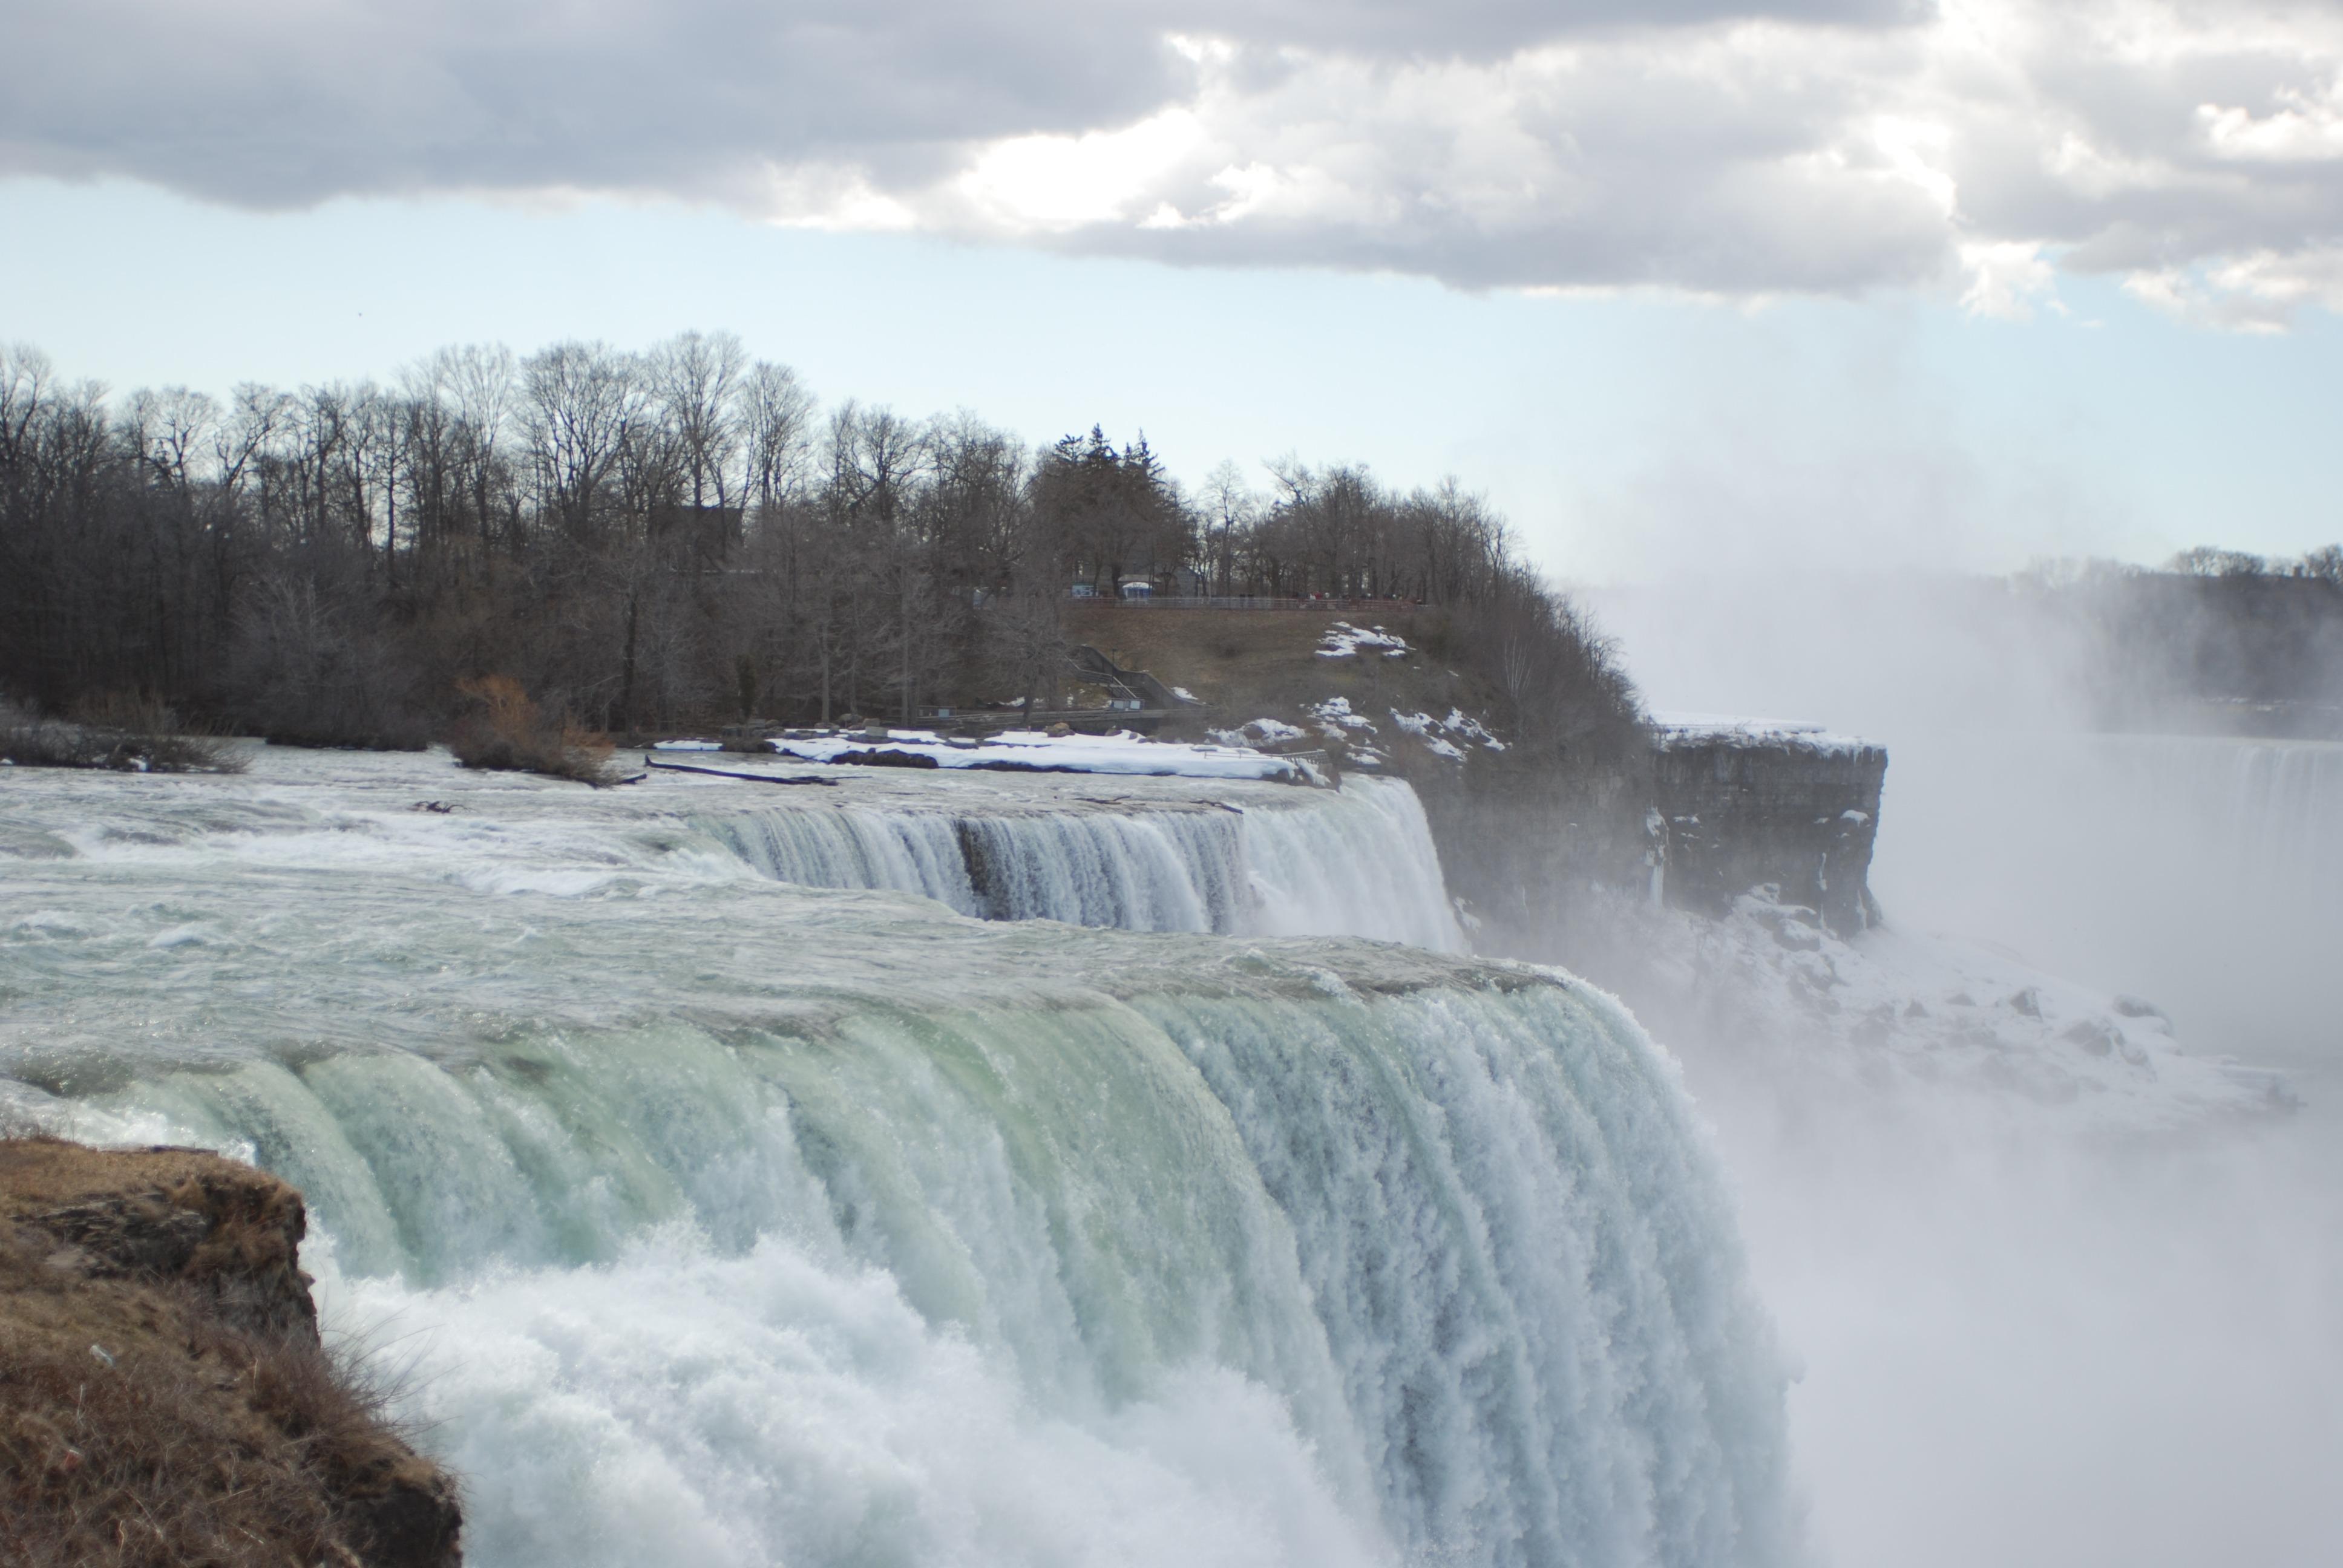 Free Images : rock, waterfall, winter, drop, mist, river